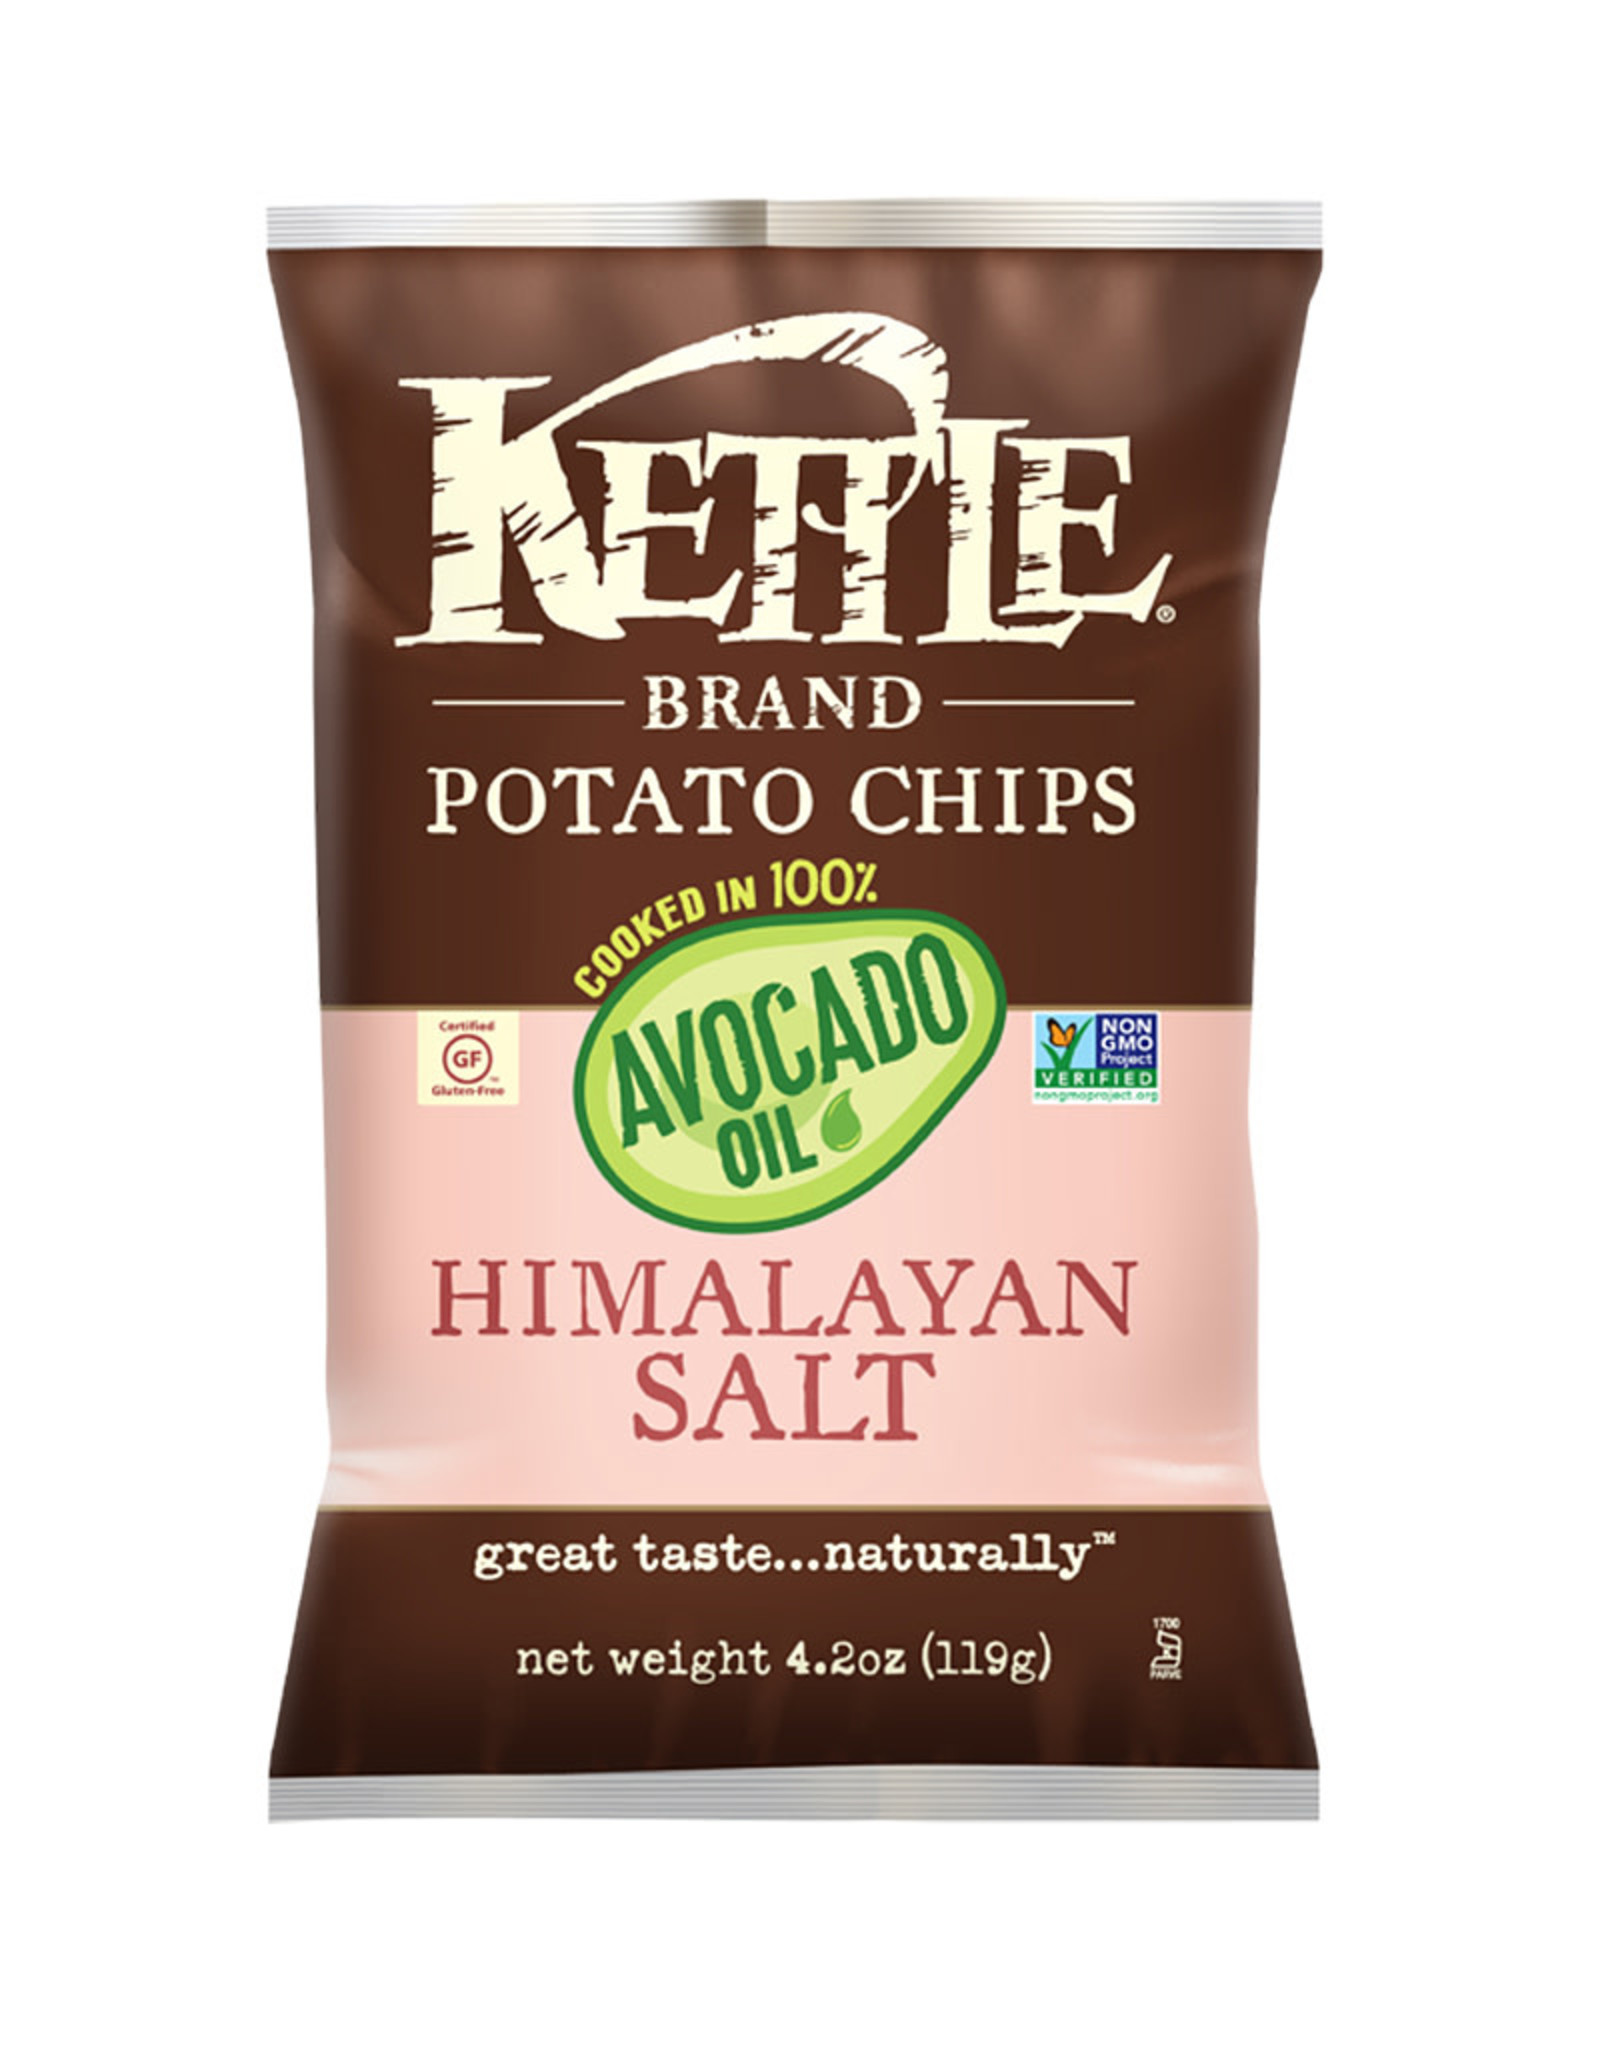 Kettle Kettle Foods - Potato Chips, Avocado Oil Himalayan Salt